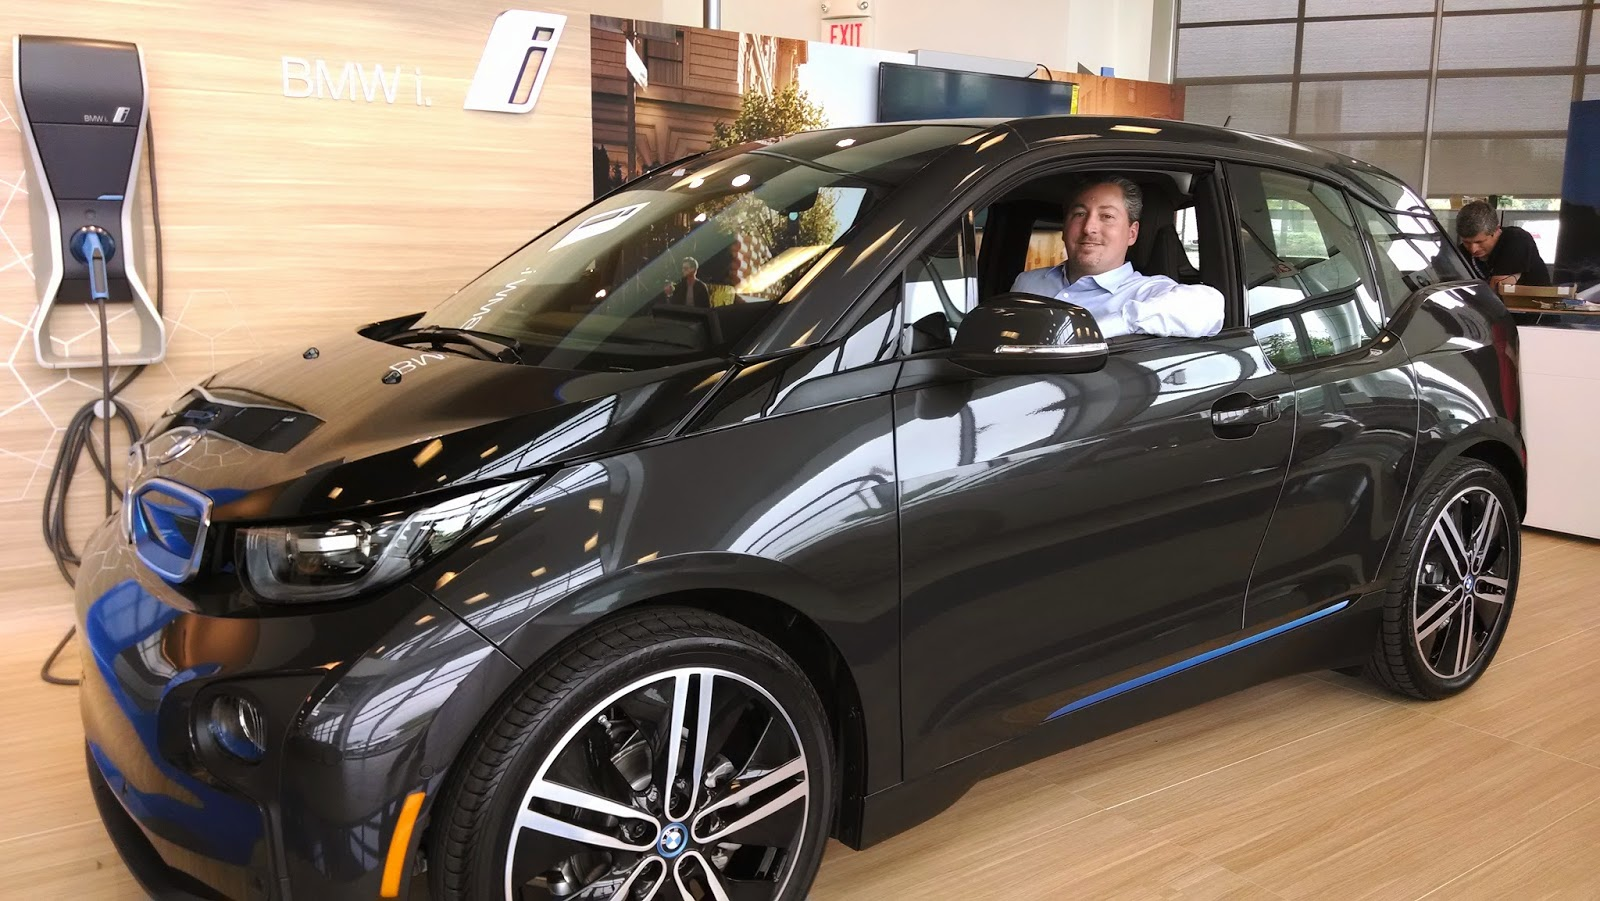 BMW: Πάνω από 100.000 οι πωλήσεις ηλεκτροκίνητων οχημάτων